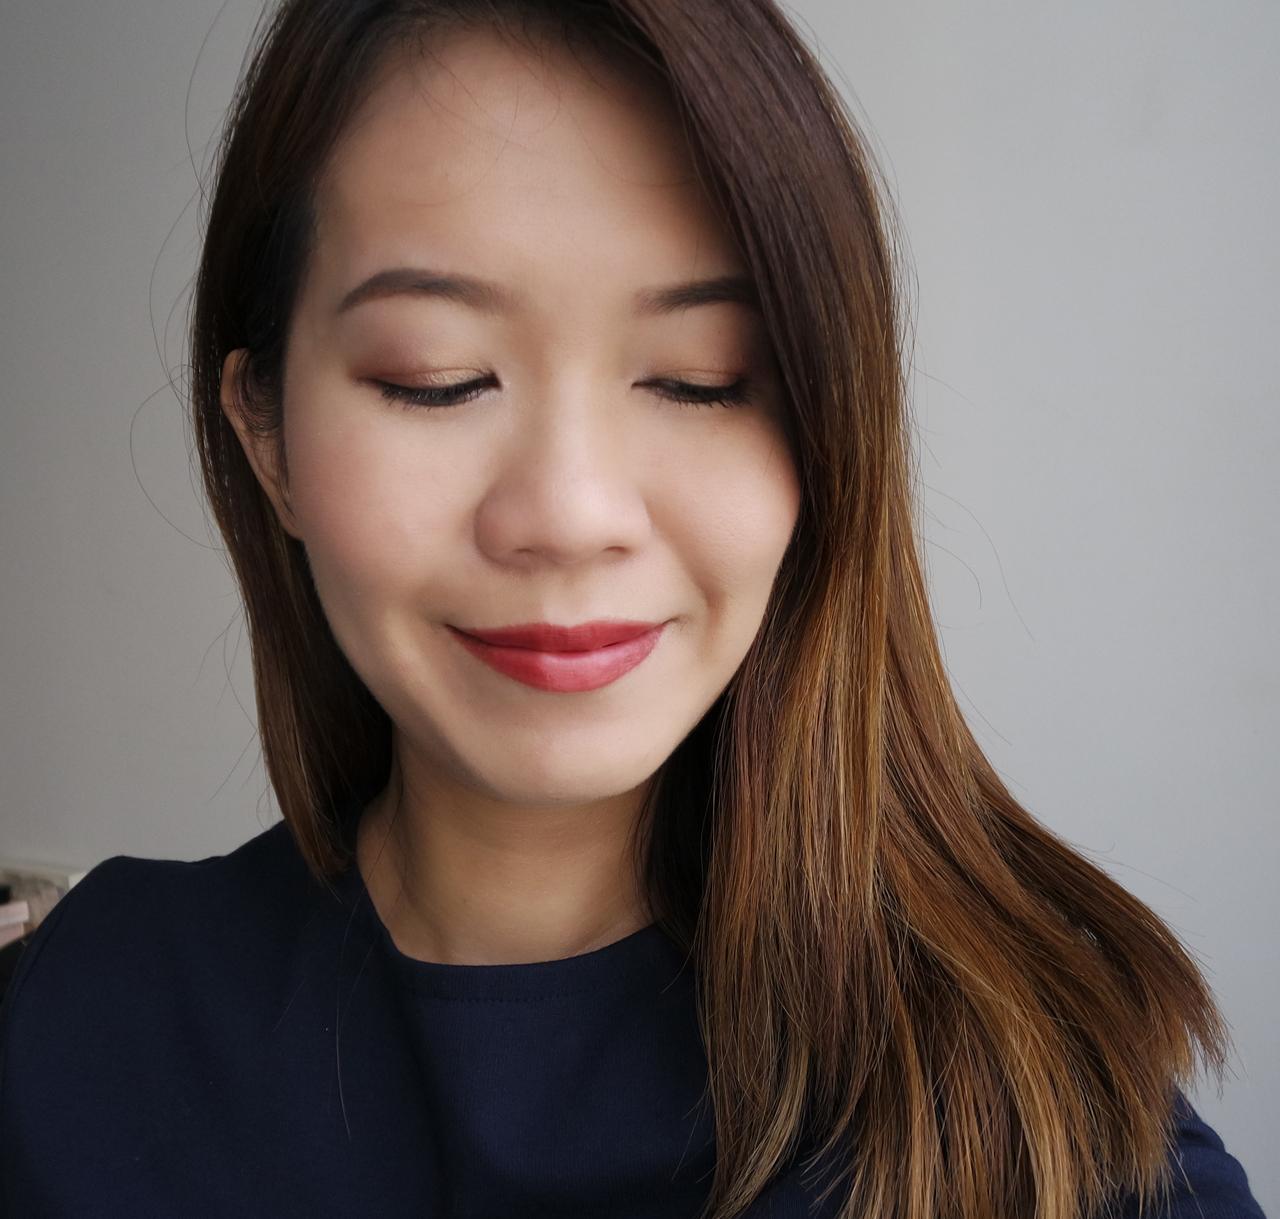 Estee Lauder Pure Color Envy Oil-Infused Sculpting Lipstick makeup look